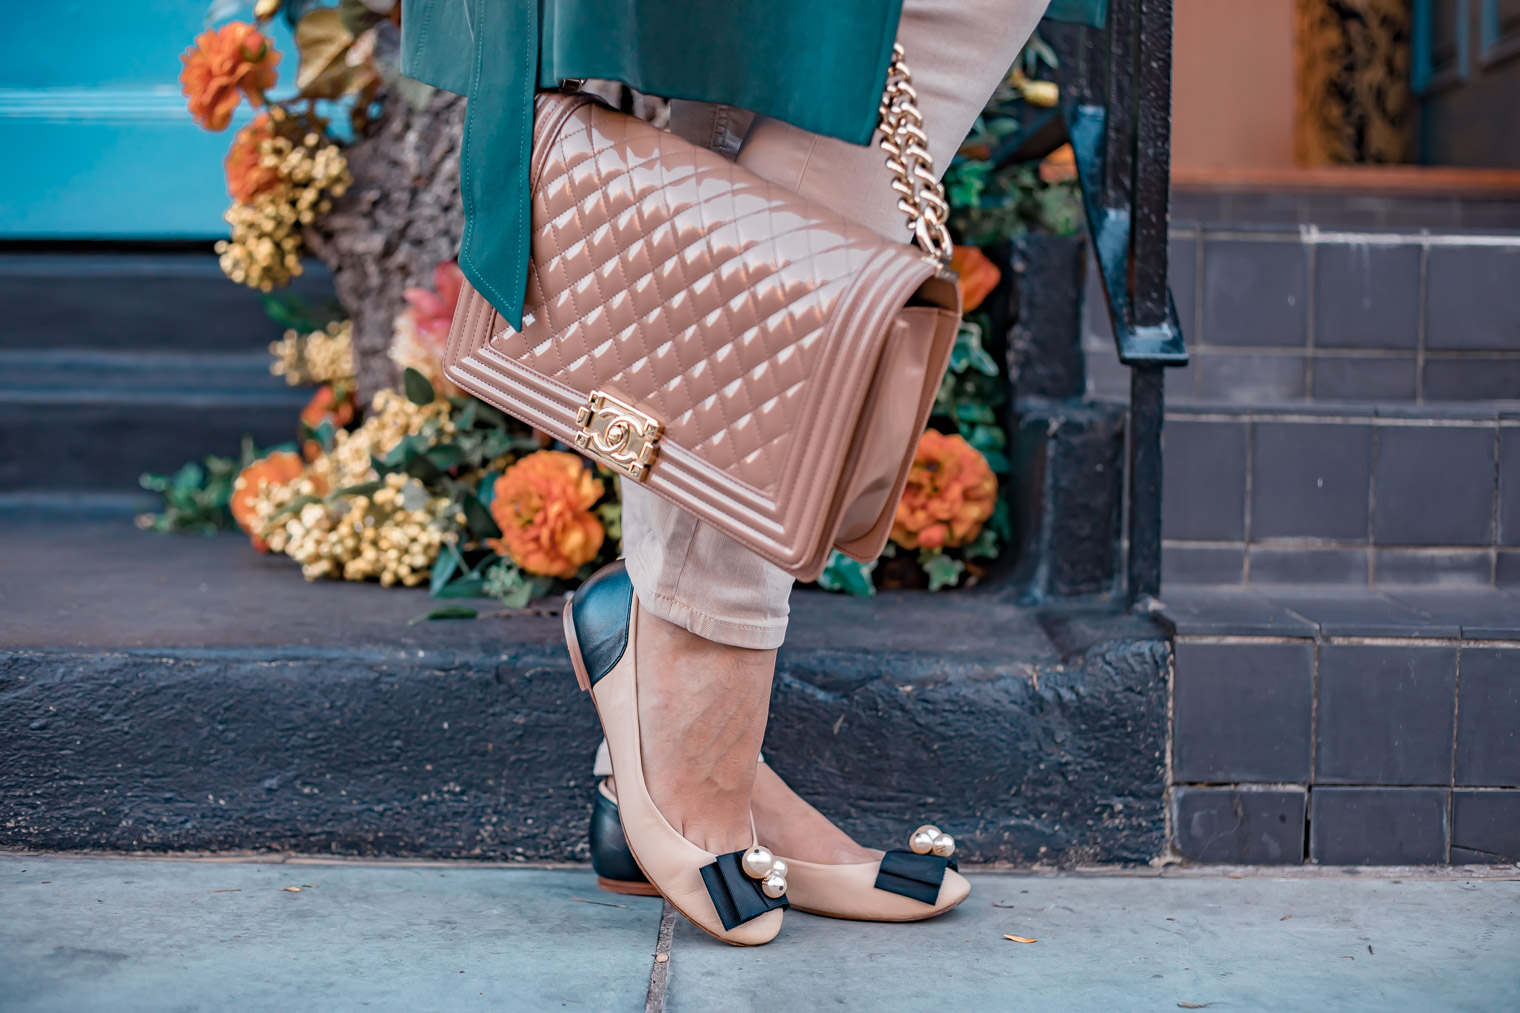 Chanel Boy bag Carolina Herrera shoes fall outfit inspiration